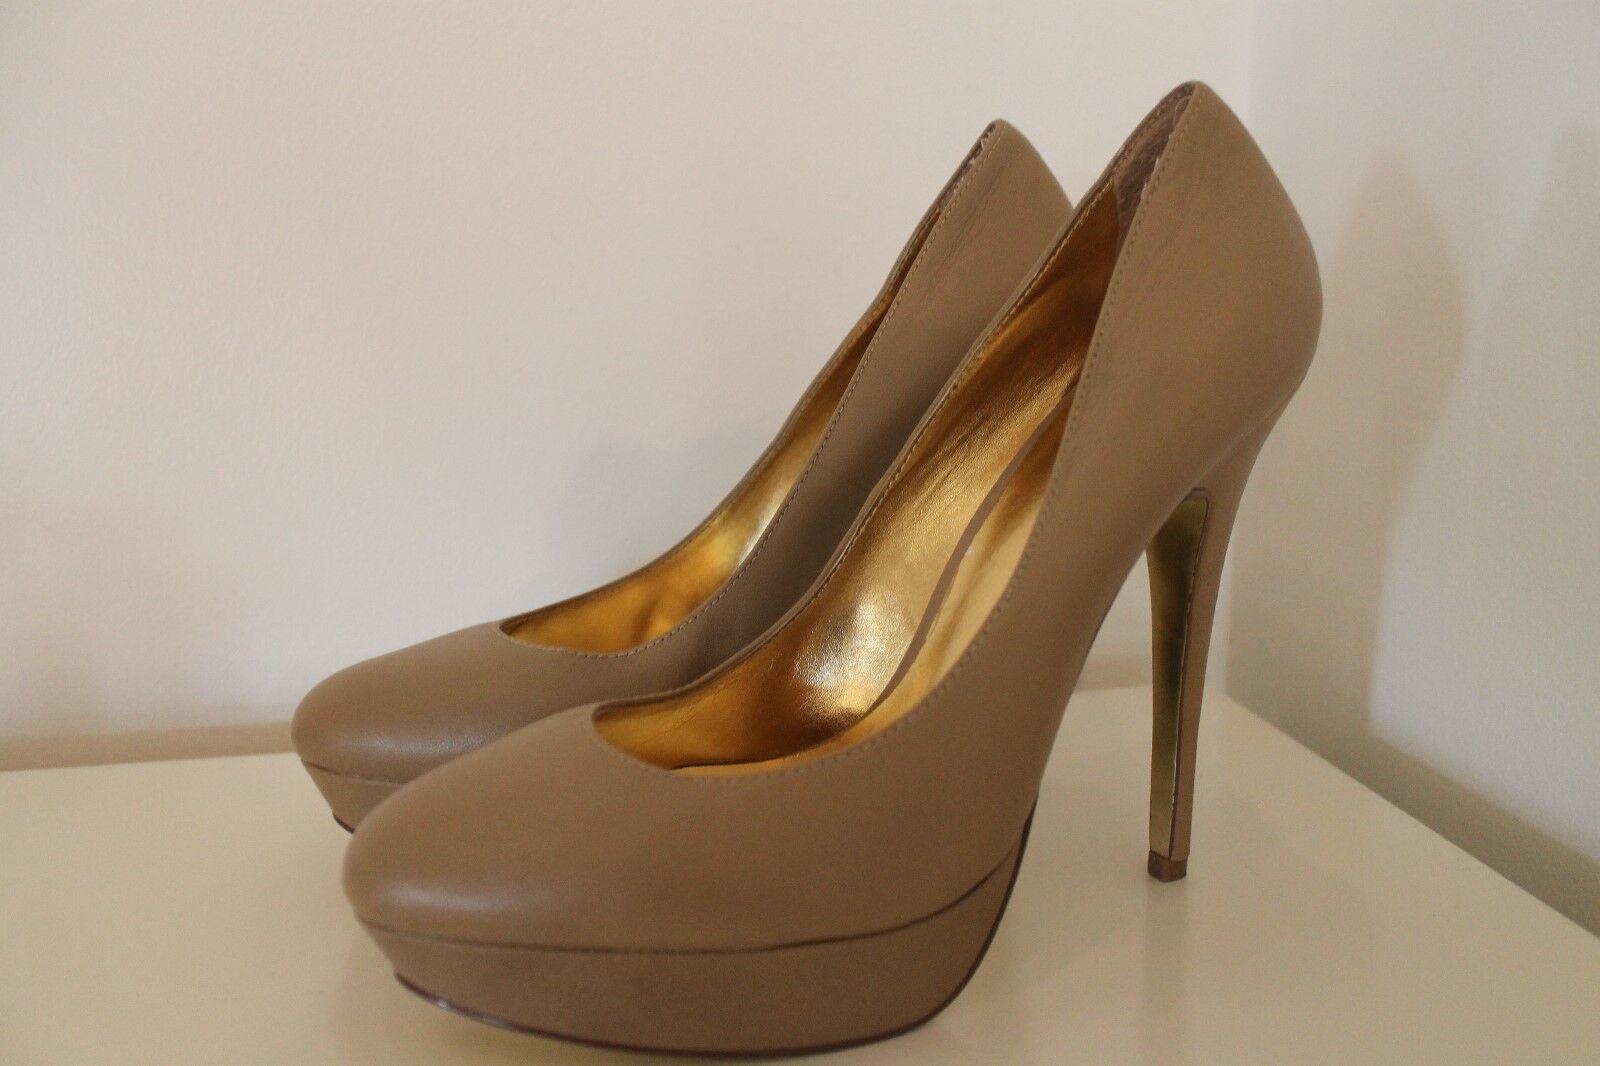 CHARLES BY DAVID CHARLES Nude shoes Heels US 9 UK 6.5 7 Eur 39 40 Worn Once